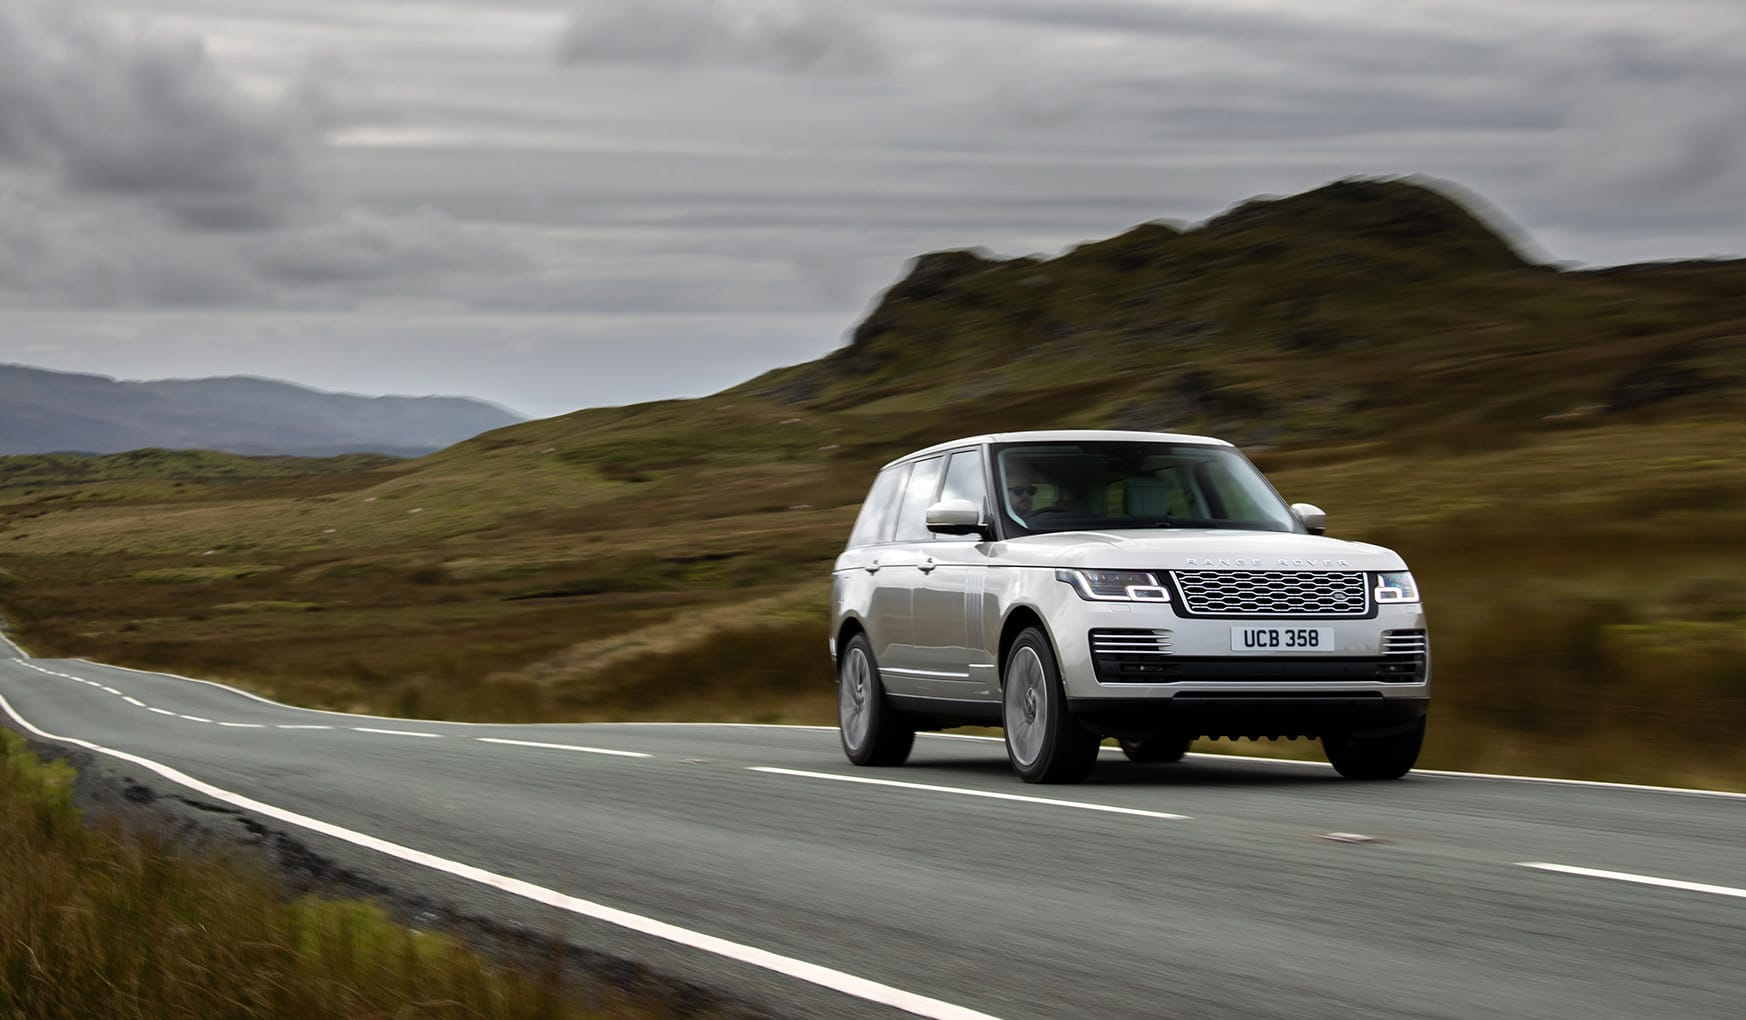 Range Rover Autobiography PHEV